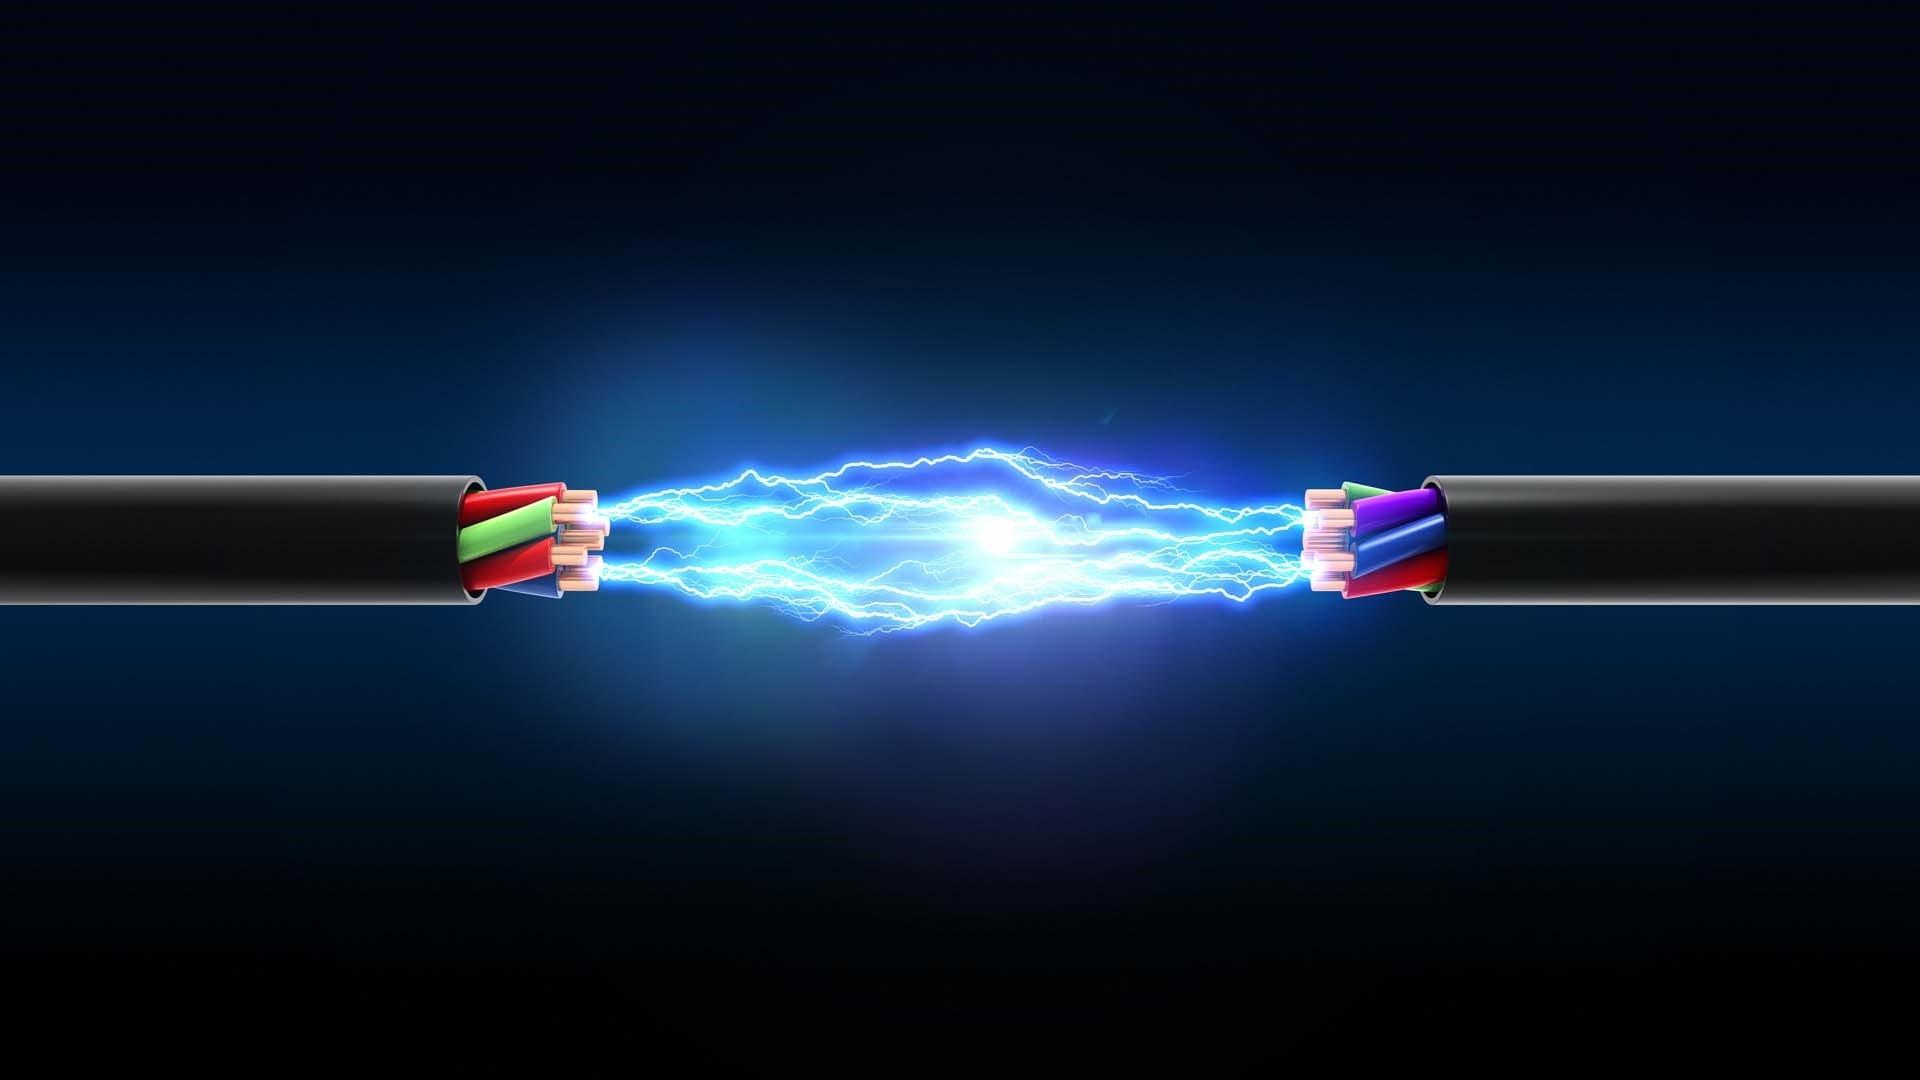 Electric hd desktop wallpaper